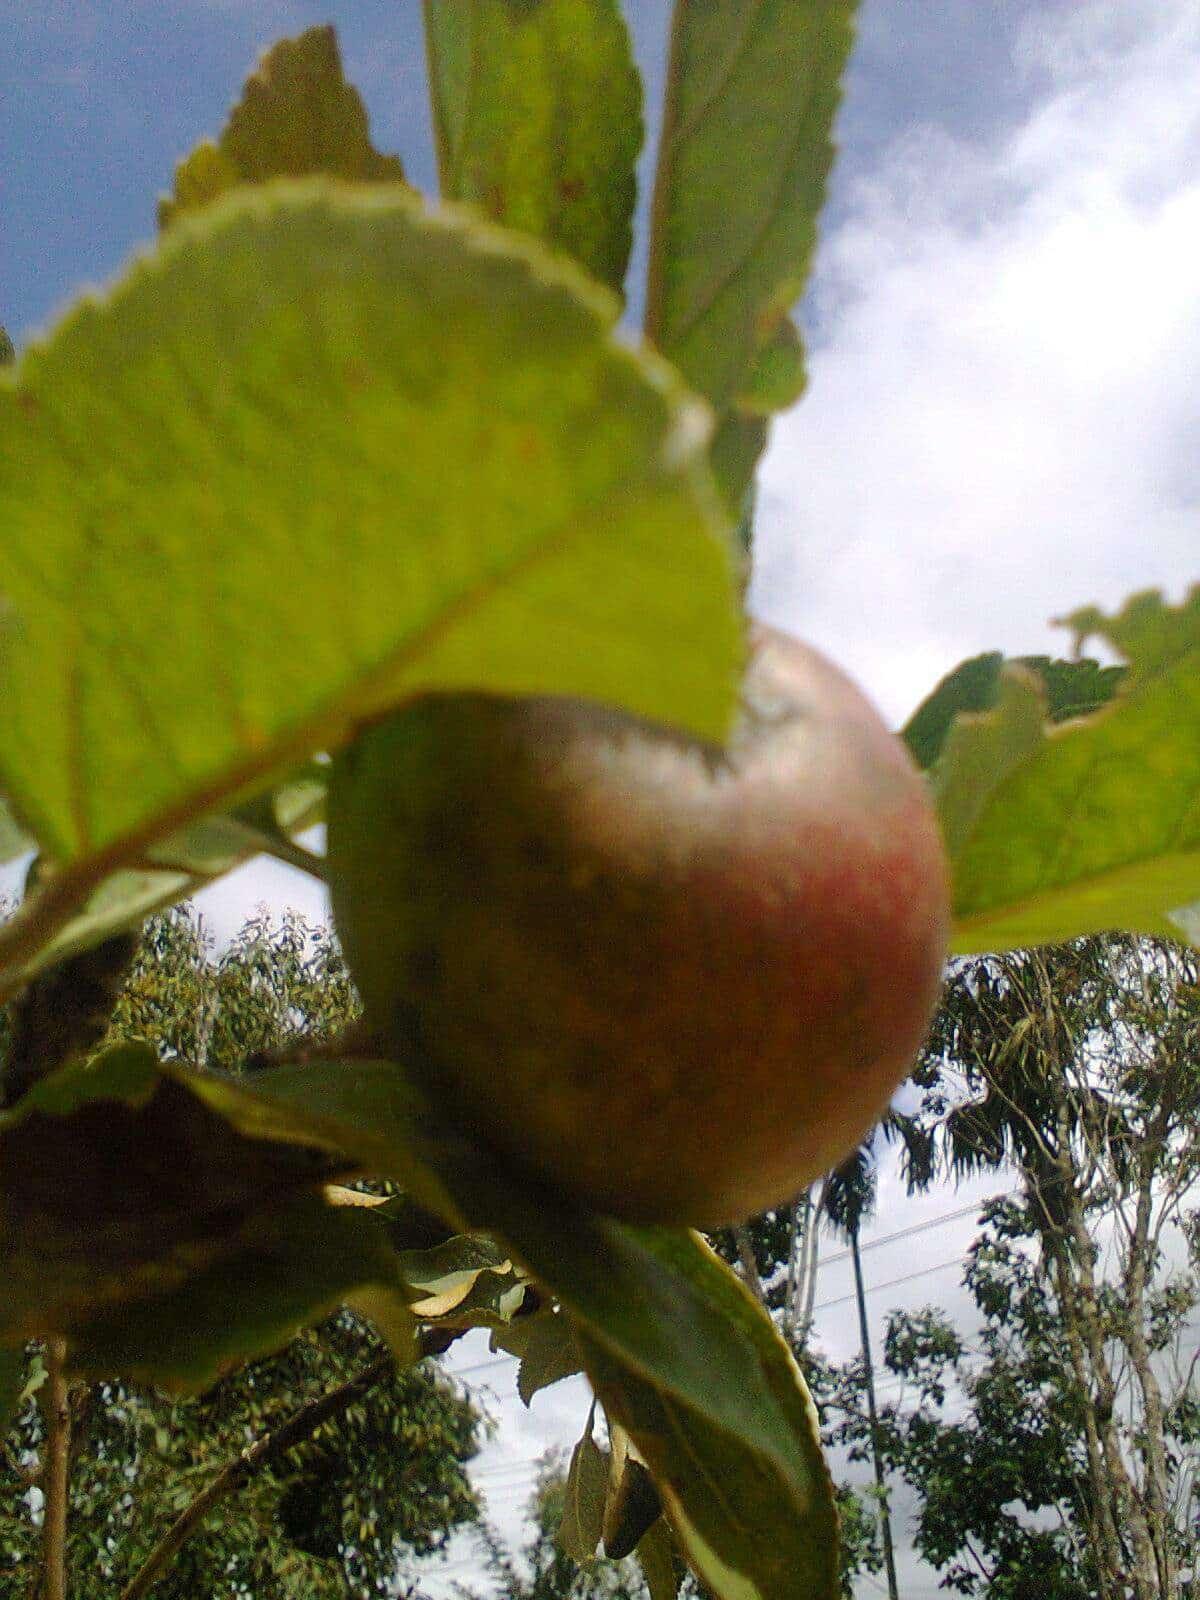 Garden Fresh Apple Nursery Photos, Panamaram, Wayanad- Pictures ...